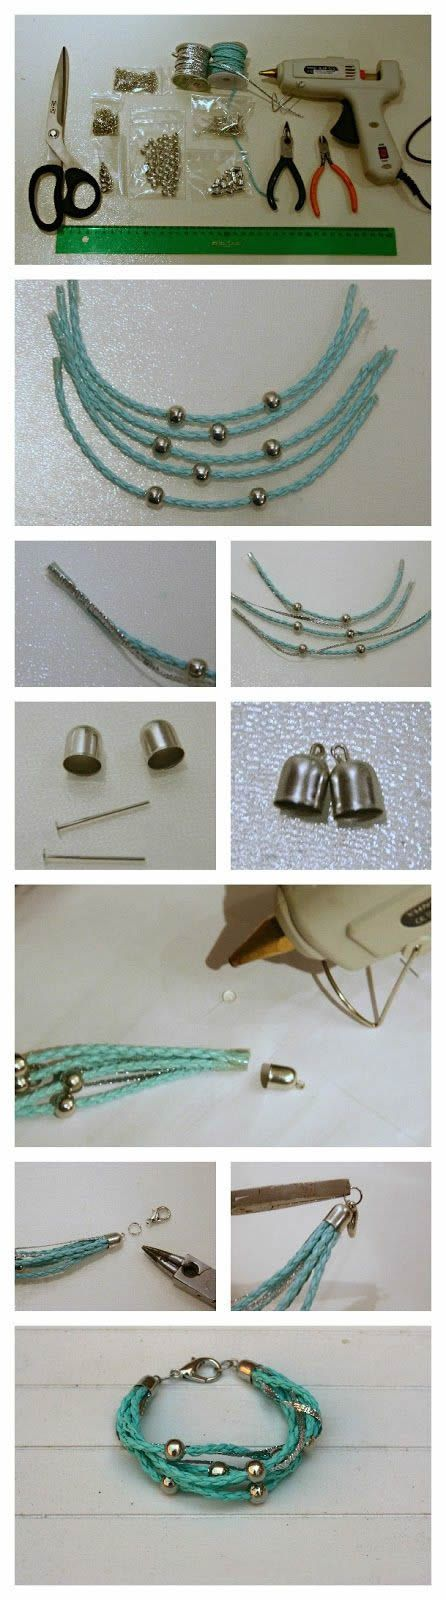 Multi-strand Leather Bracelet DIY, jewelry making http://tech.beads.us/details-Multi-strand-Leather-Bracelet-3063.html